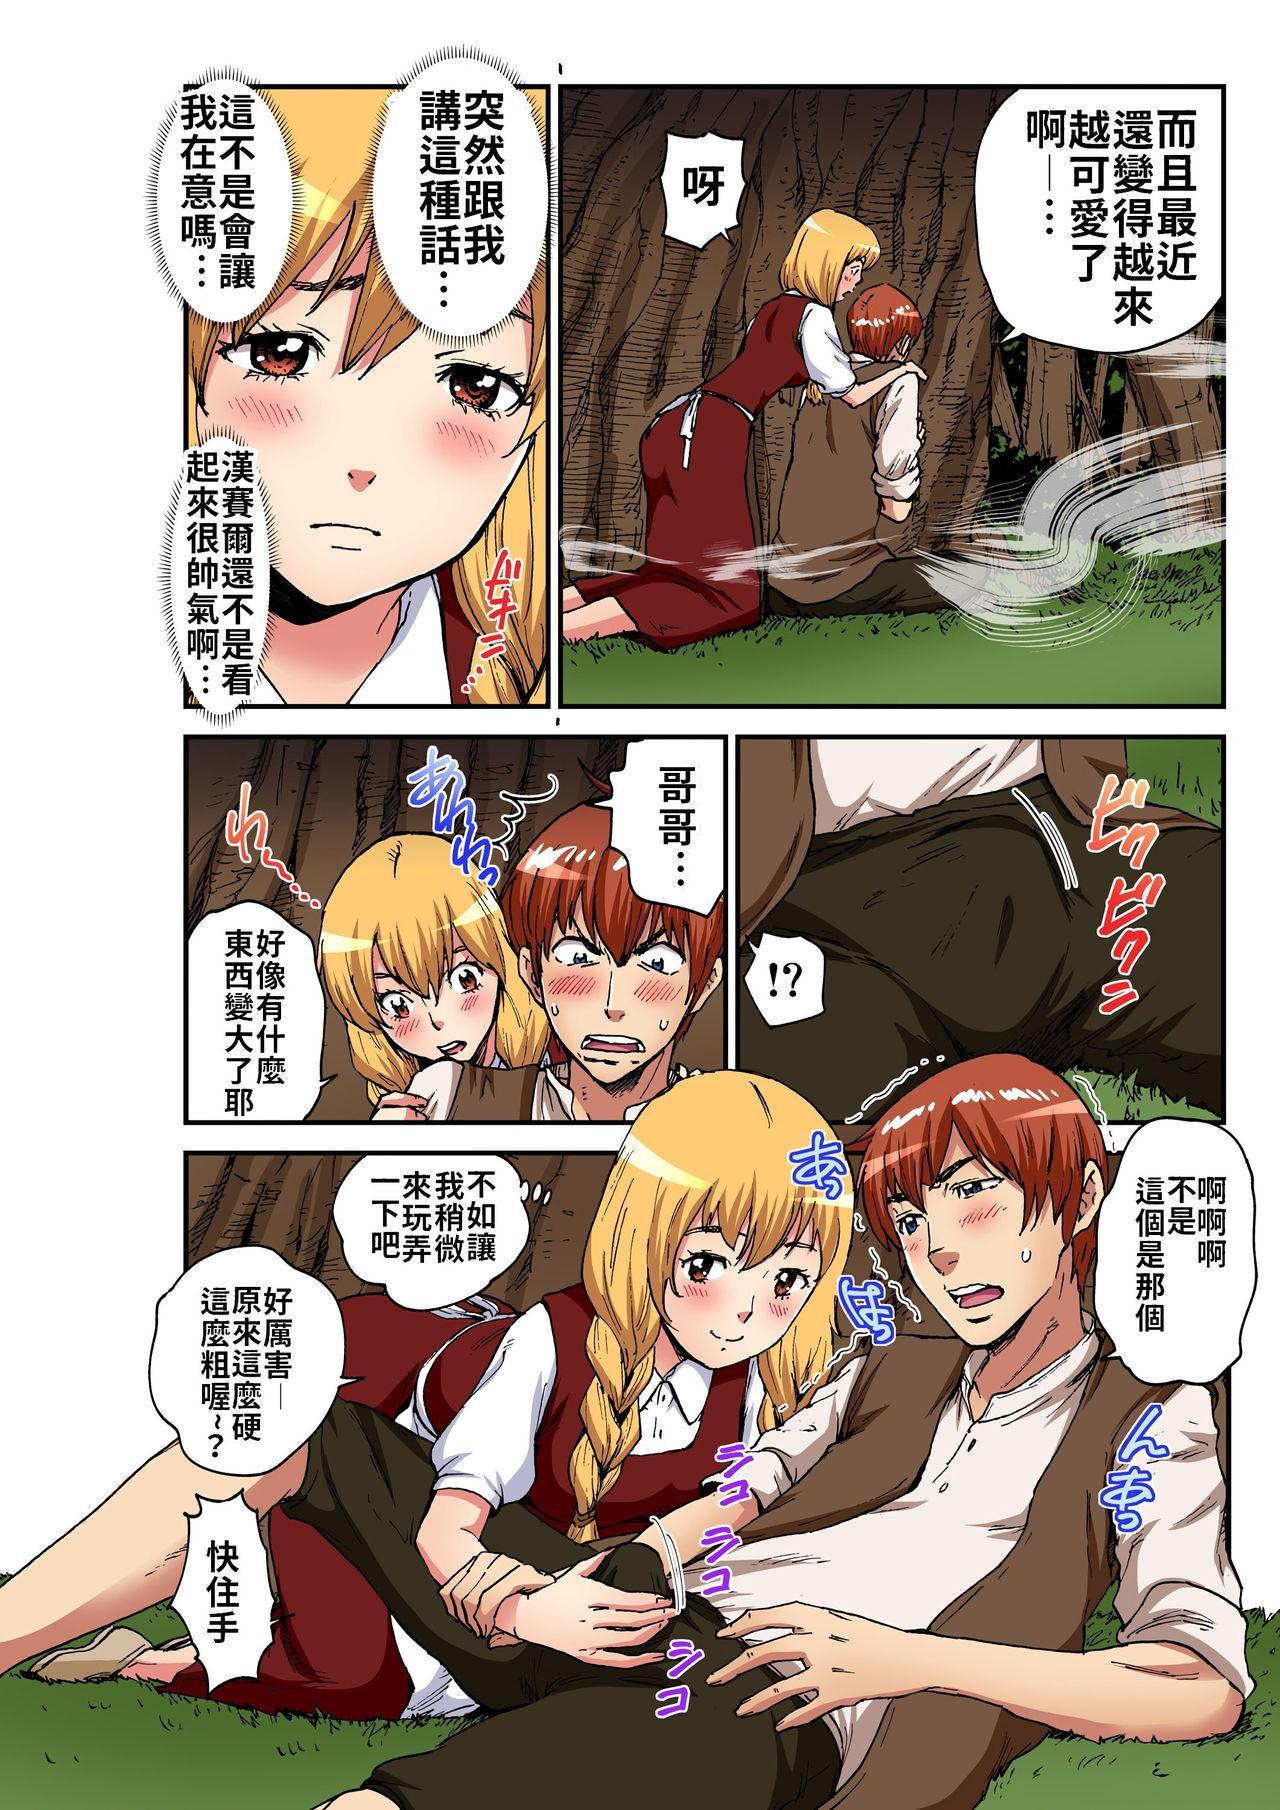 Otona no Douwa ~Henzeru to Gure-teru   大人的童話~糖果屋 6